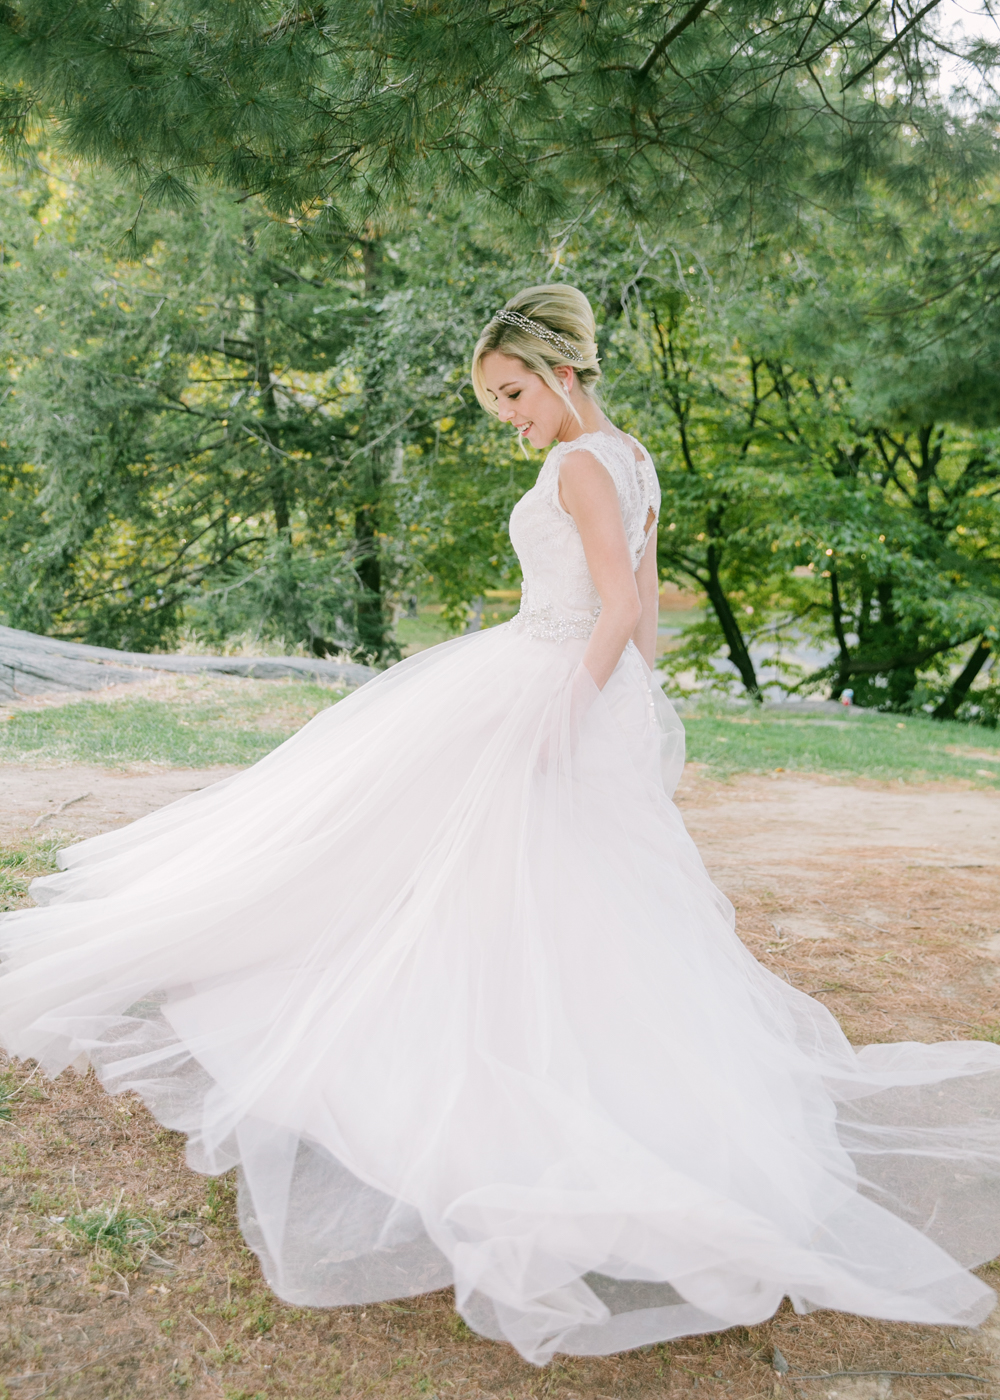 Wedding_photography_by_Tanya_Isaeva-10.jpg